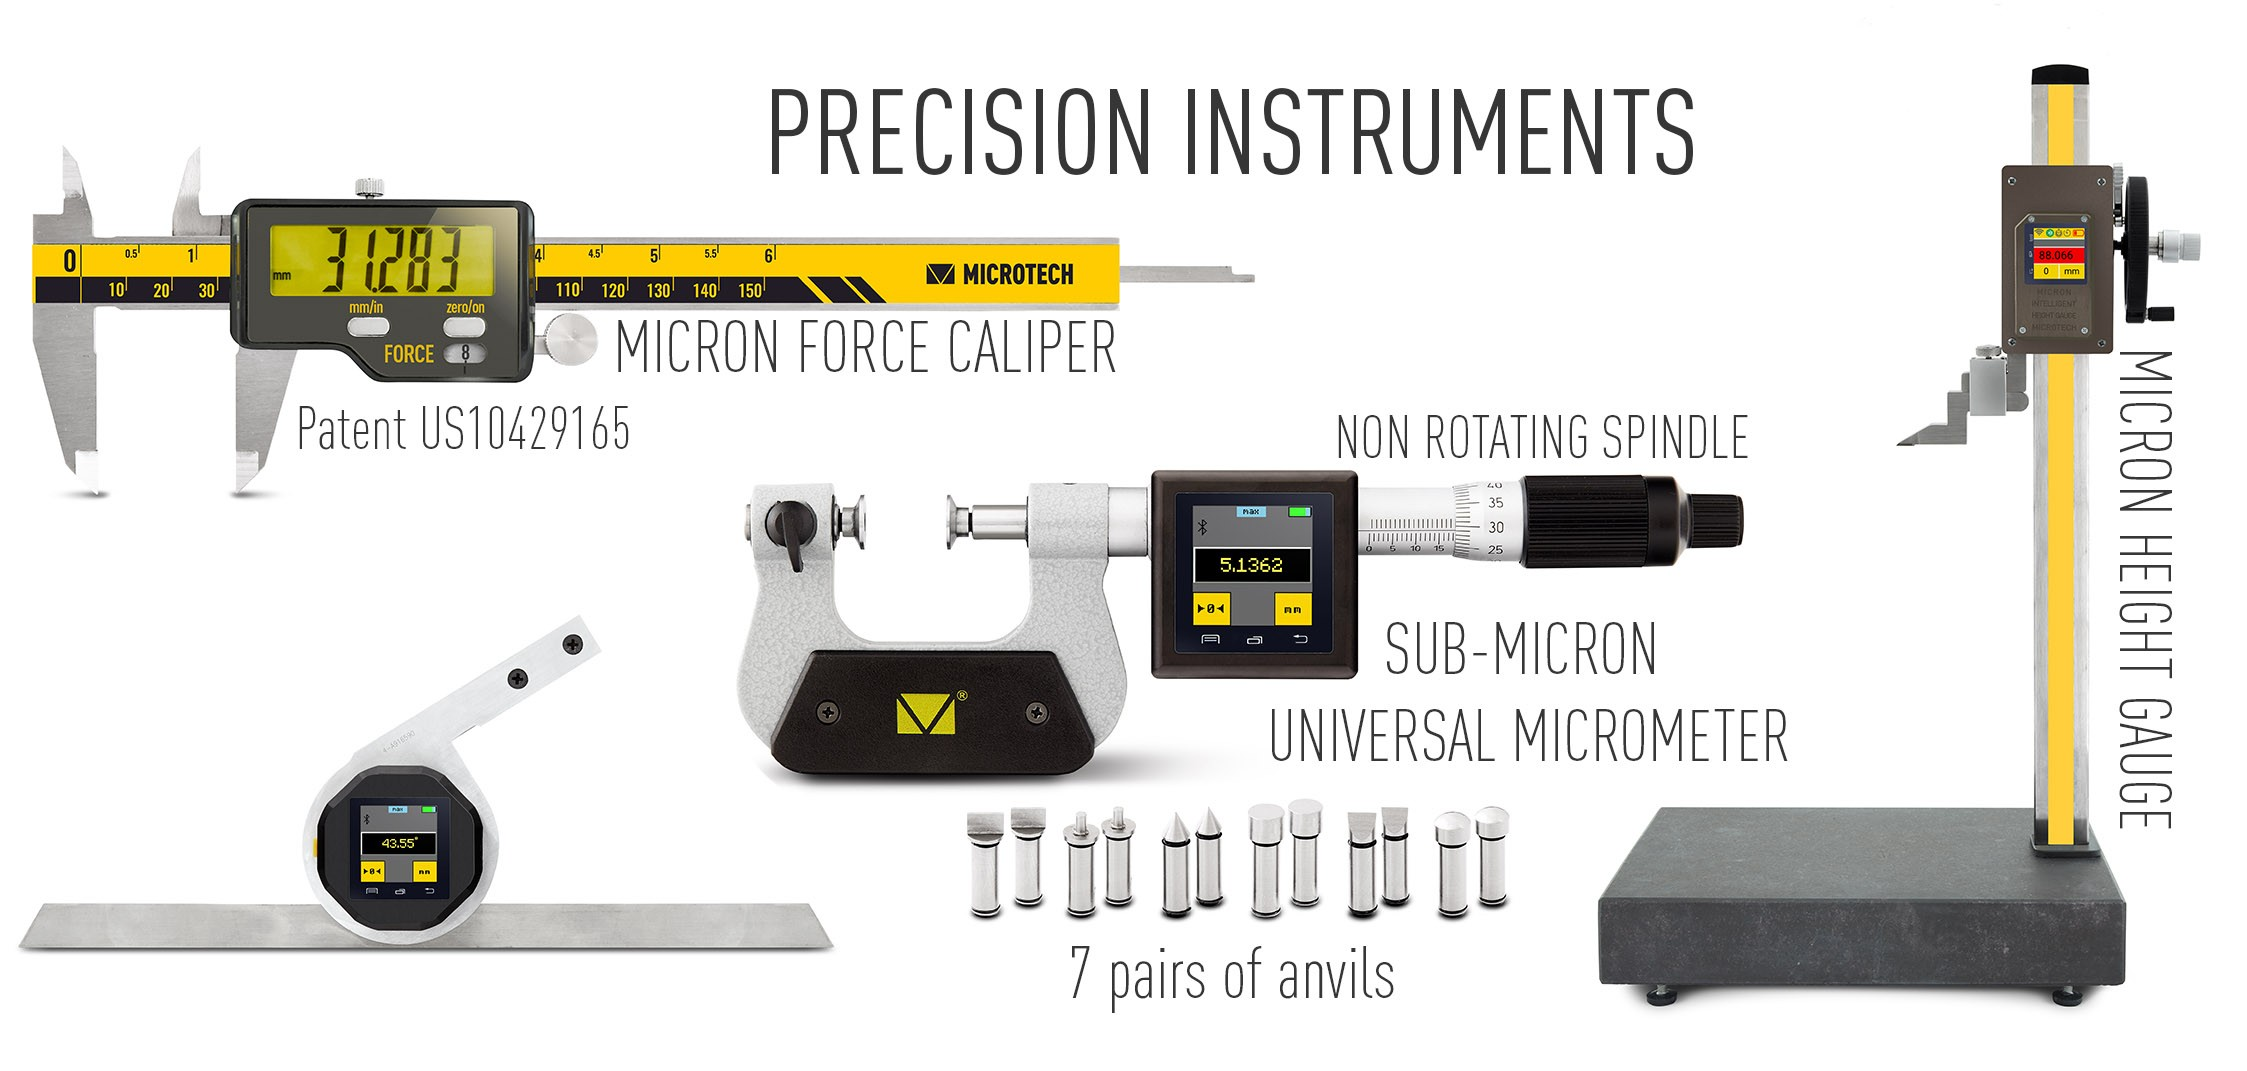 Industry 4.0 instruments